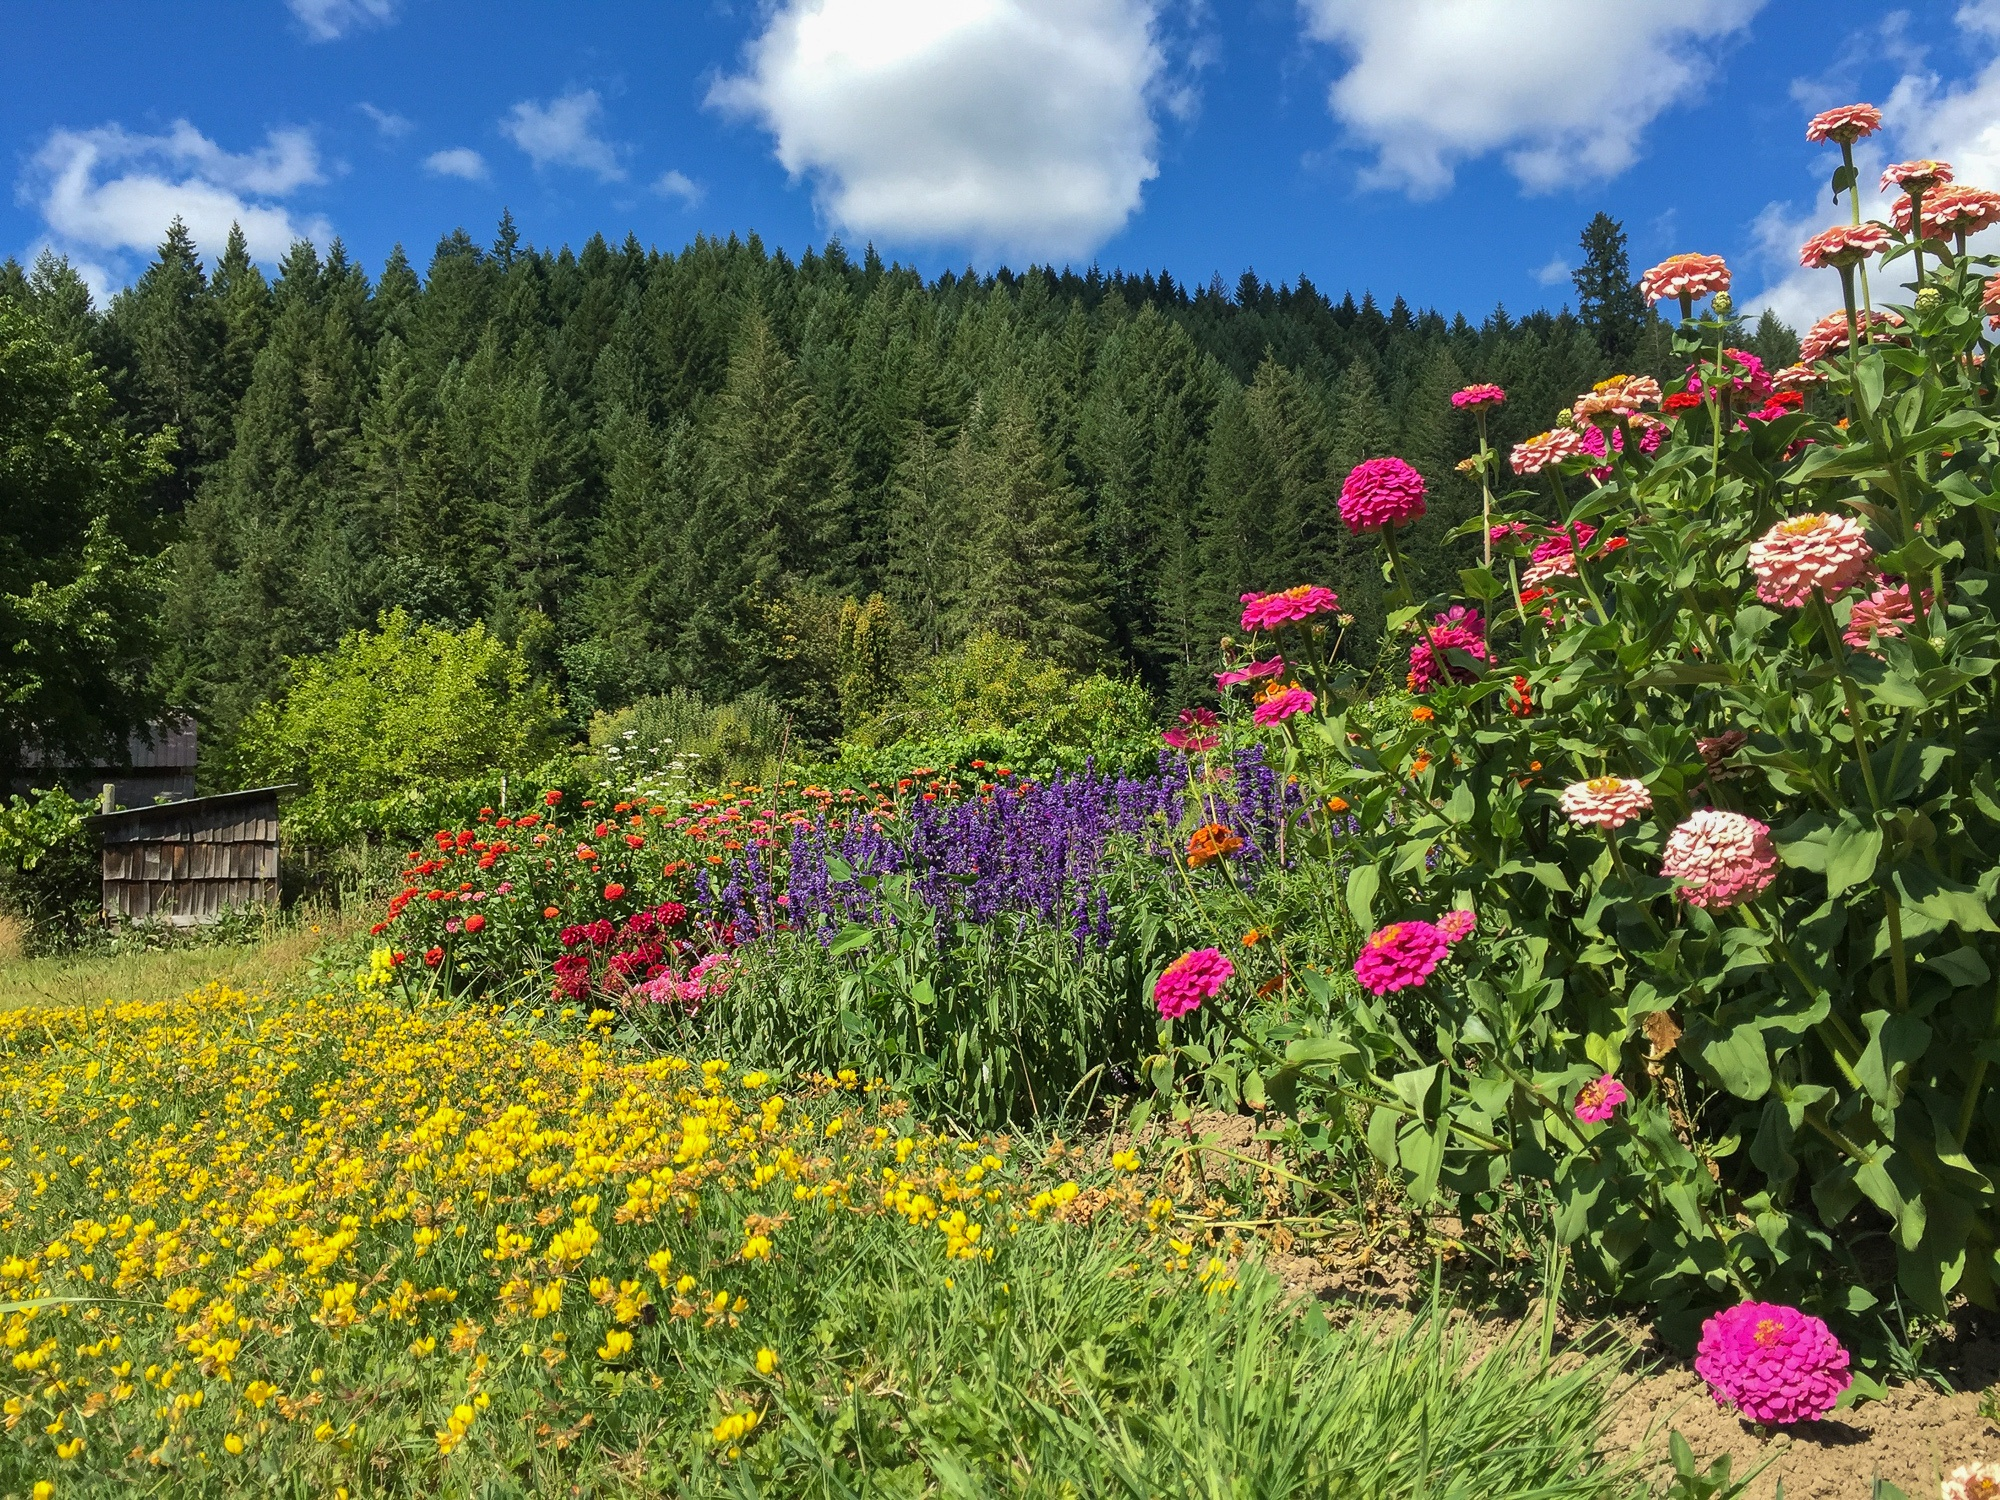 Flower garden view from Leaping Lamb Farm in Alsea, Oregon